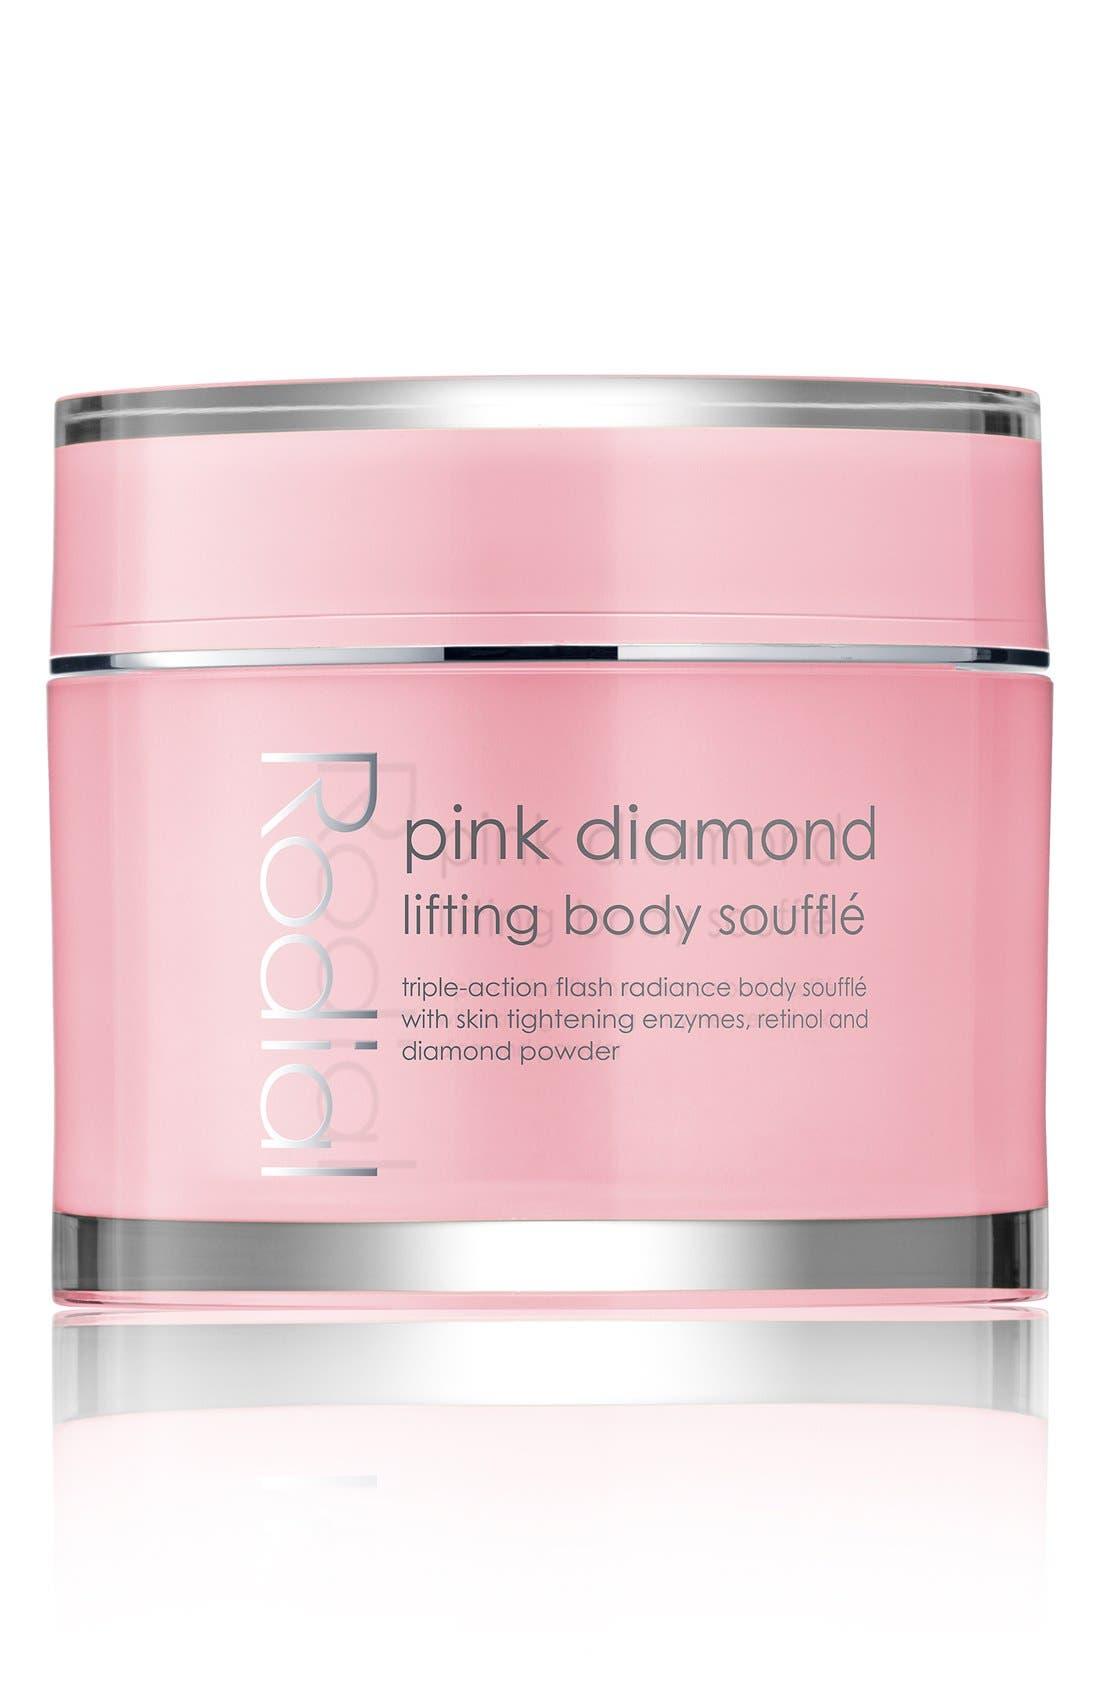 SPACE.NK.apothecary Rodial Pink Diamond Lifting Body Soufflé